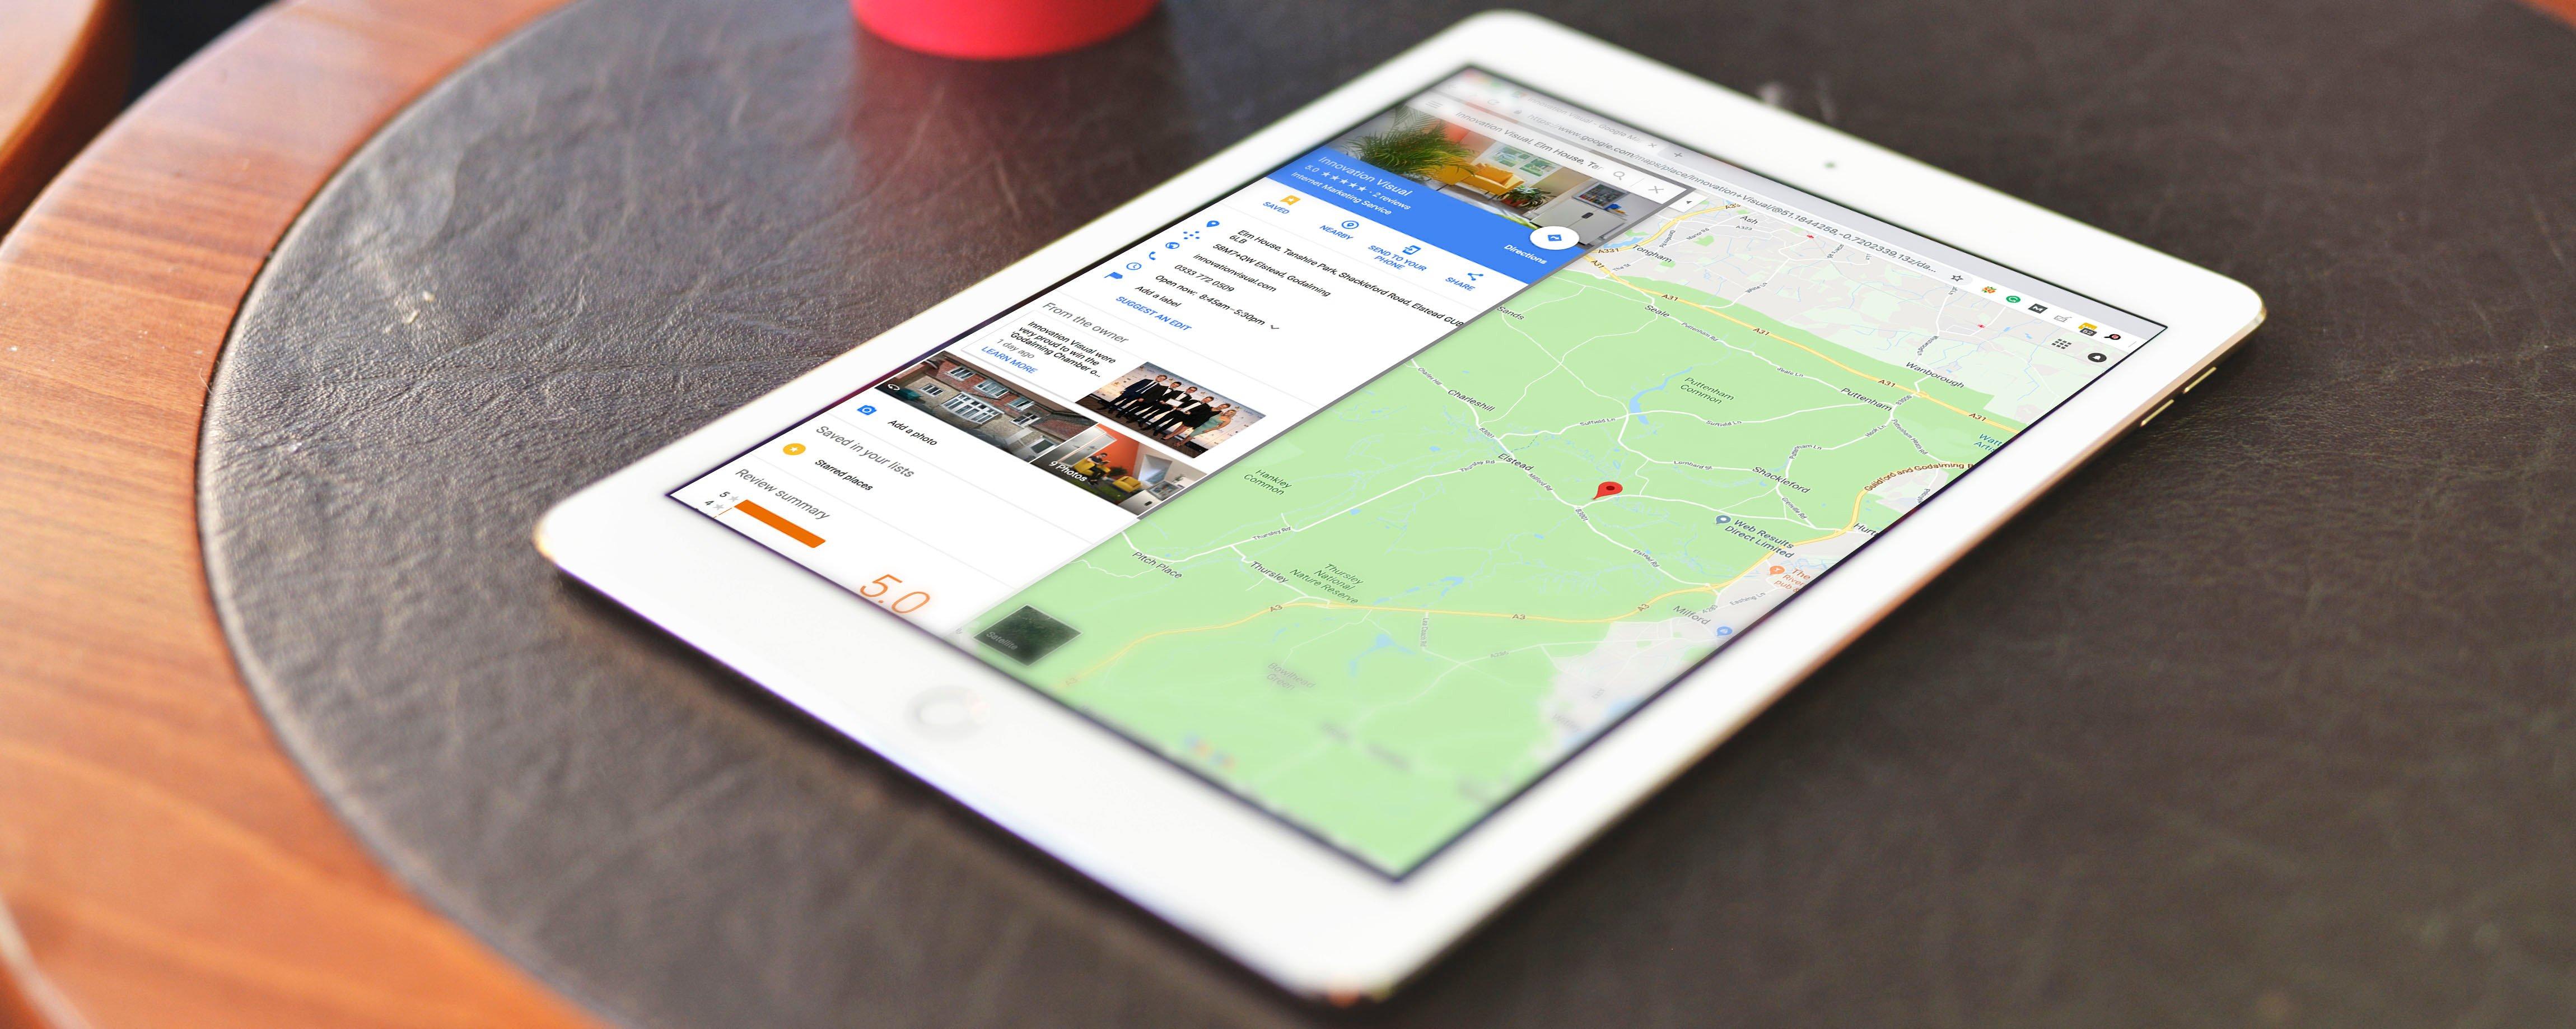 Local-SEO-Innovation-Visual-Surrey-office-google-maps-1.jpg